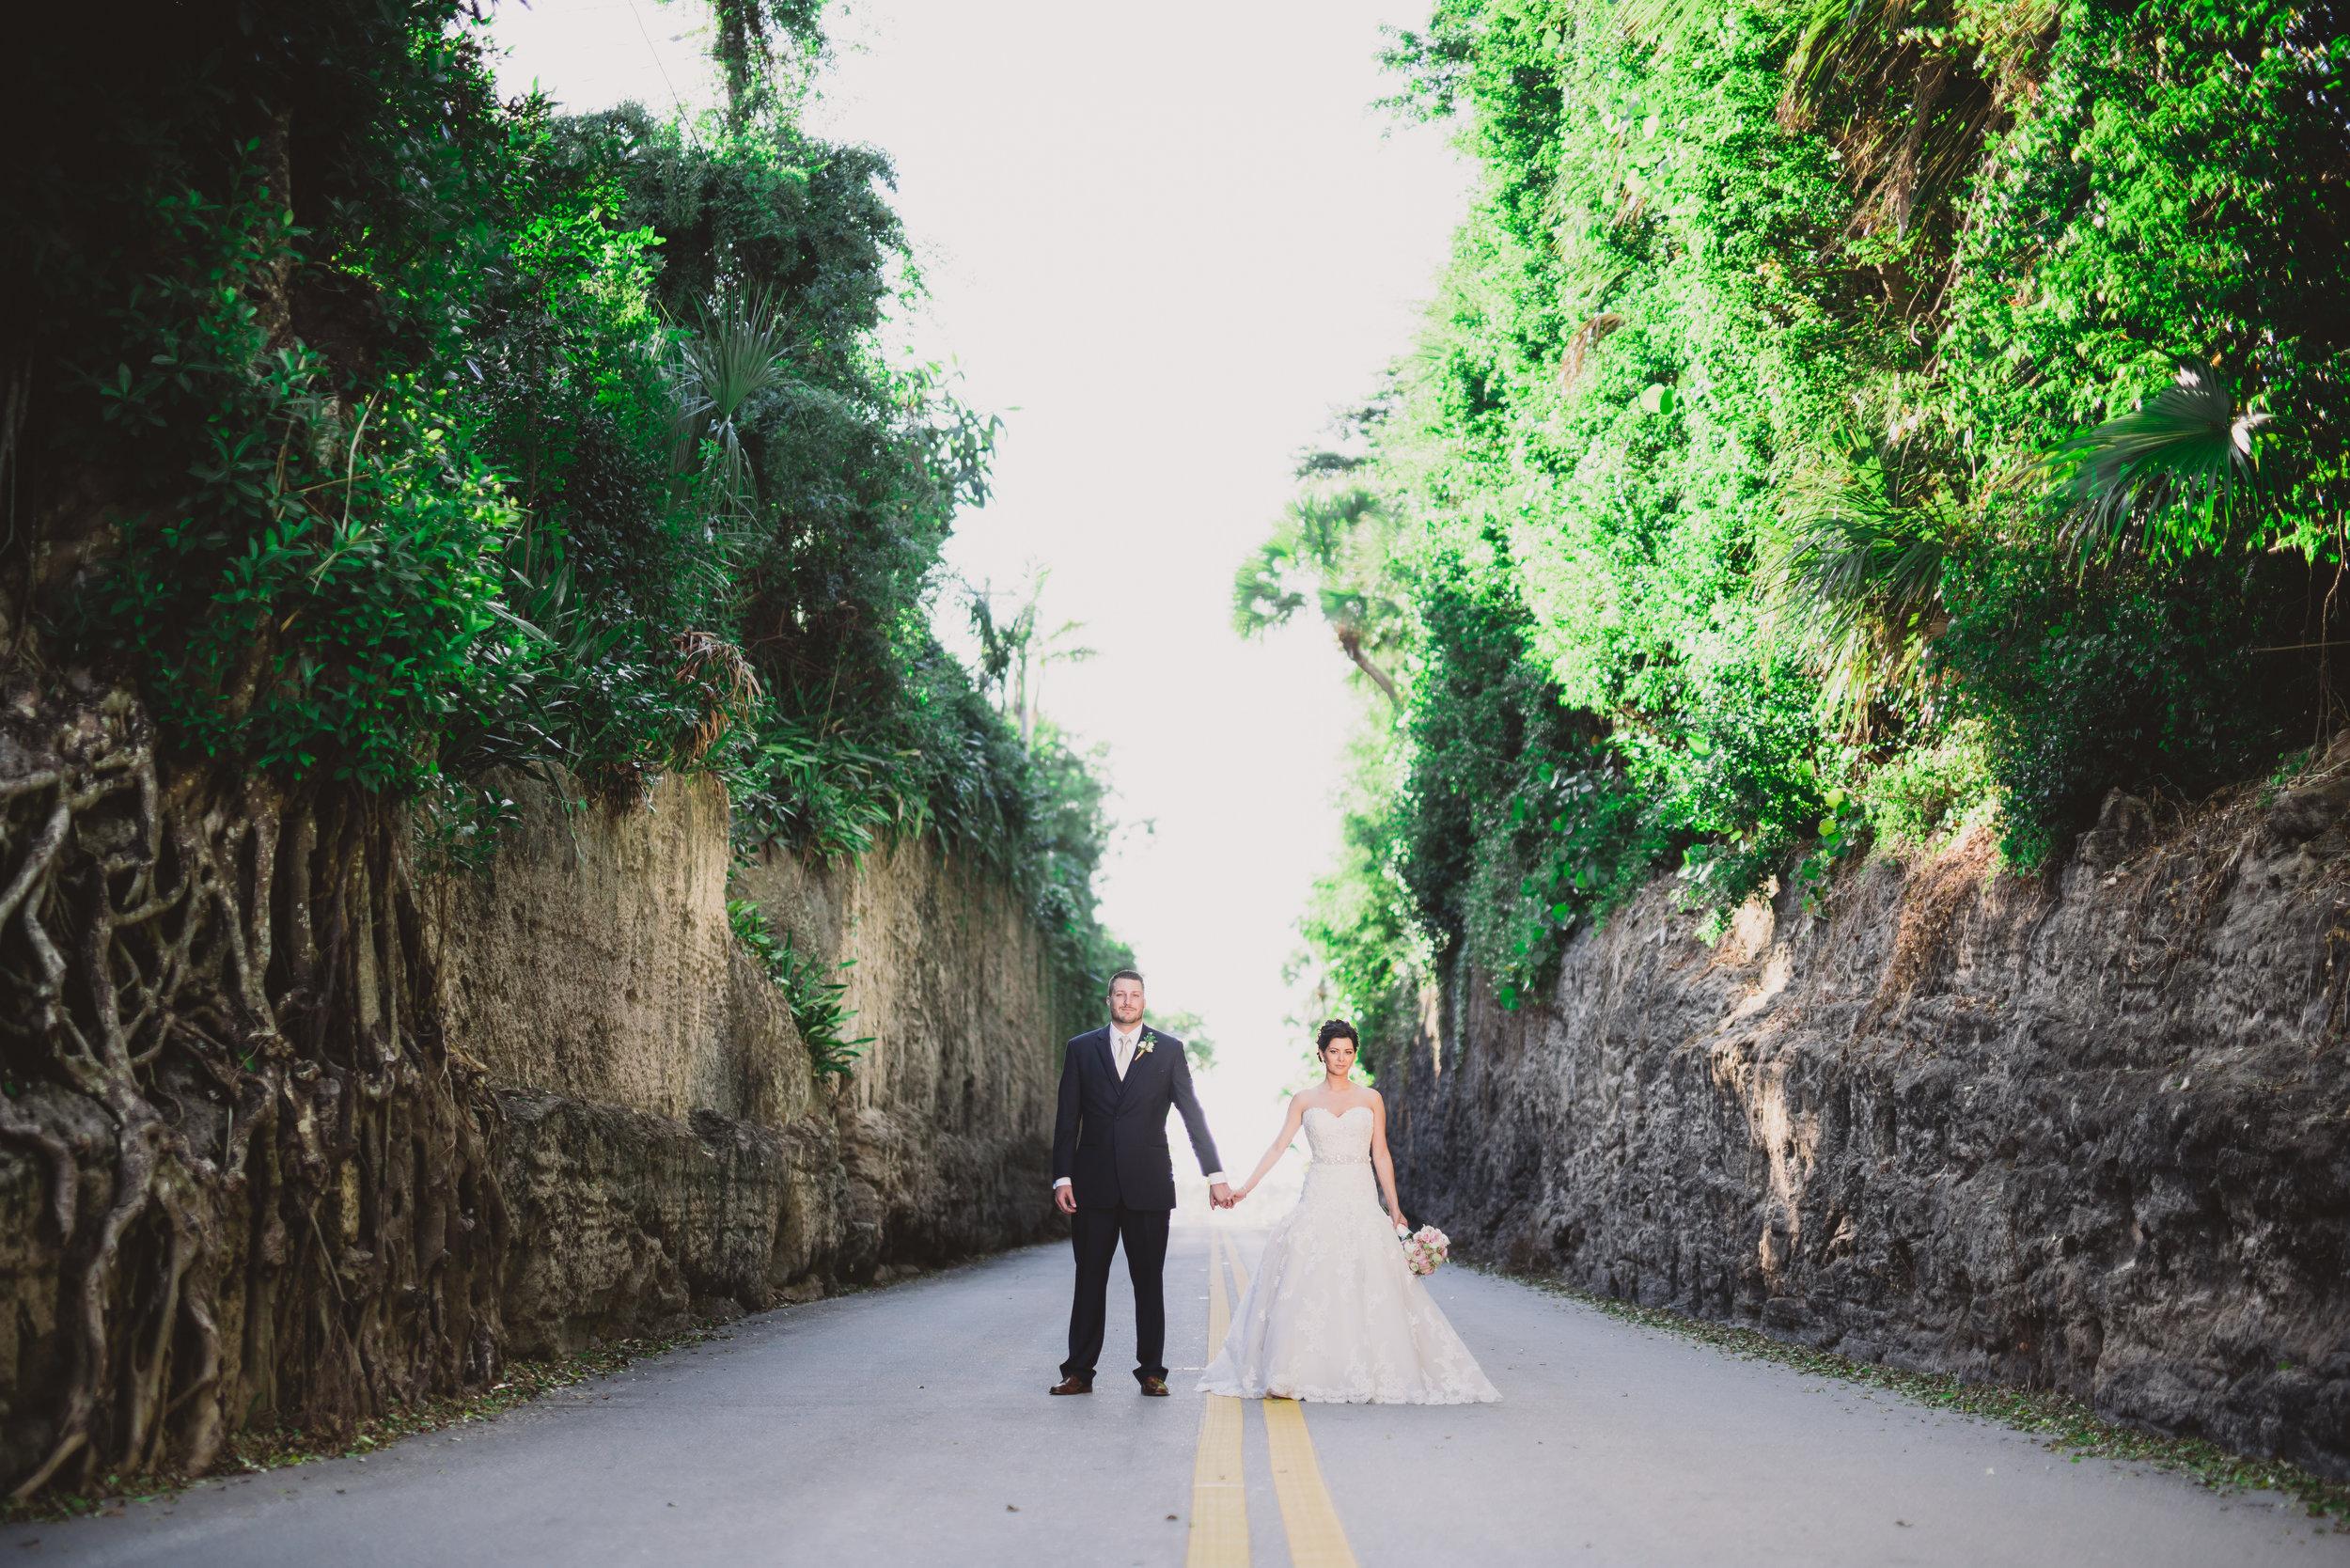 Sabrina & Anthony Wedding | Highlights-0031.jpg